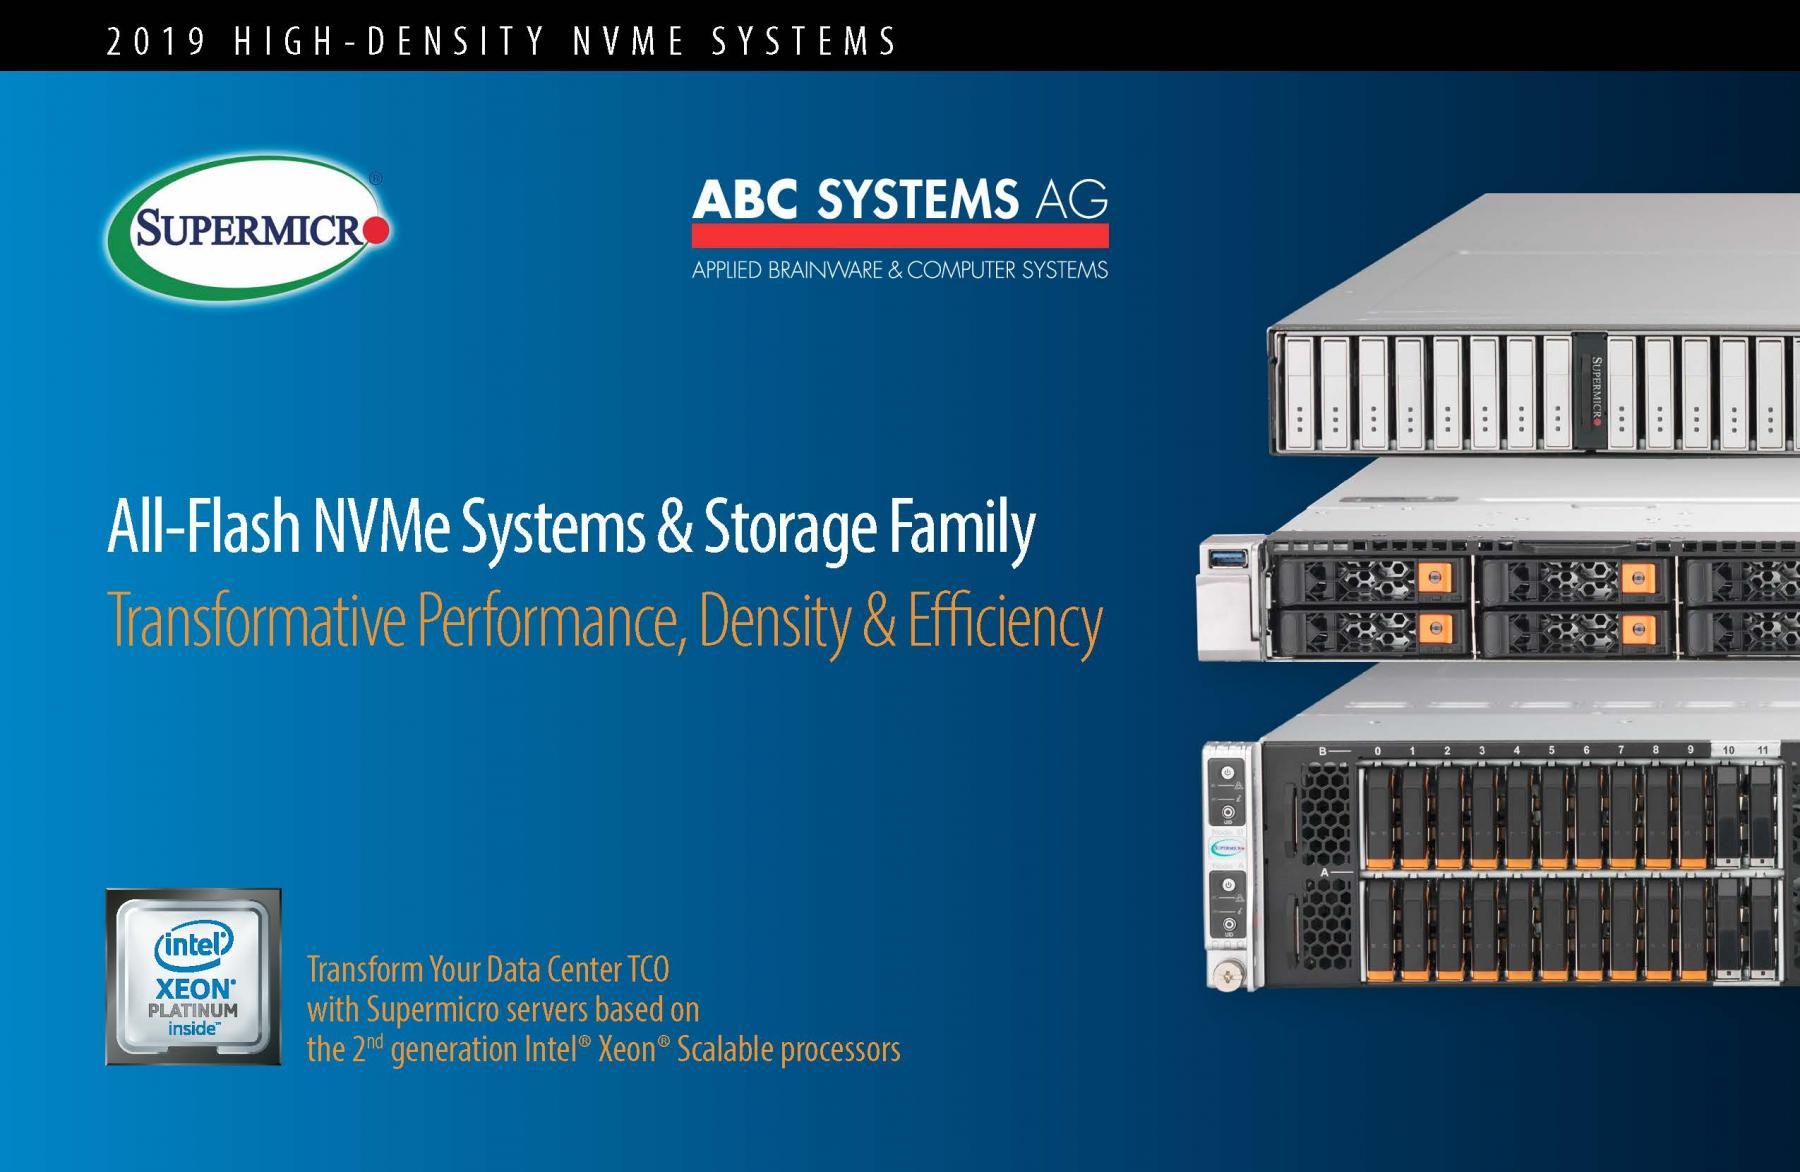 02 nvme storage-family half 190716 rev1 ABC 1